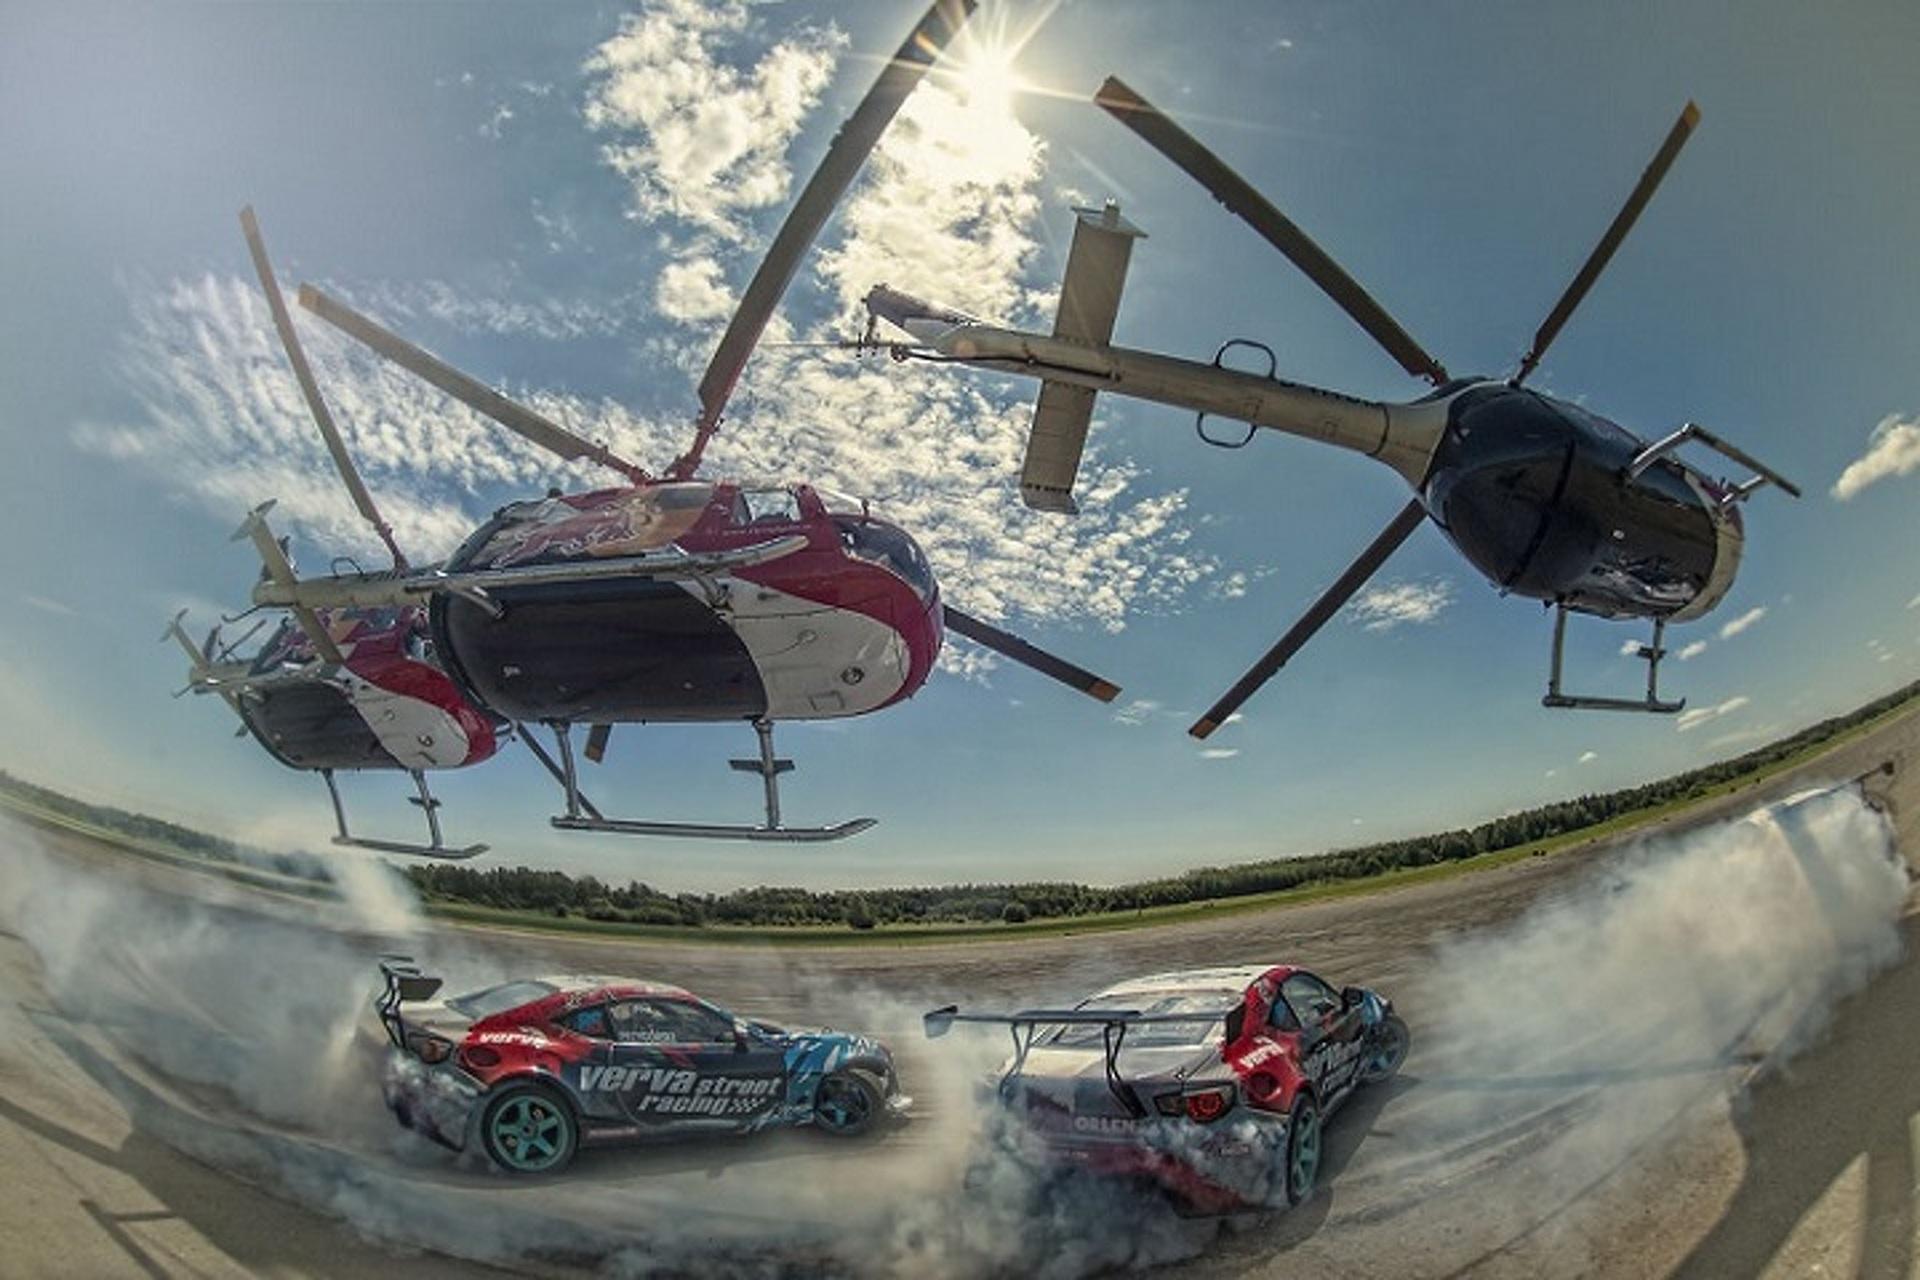 Watch as Daredevil Felix Baumgartner Drifts a Helicopter